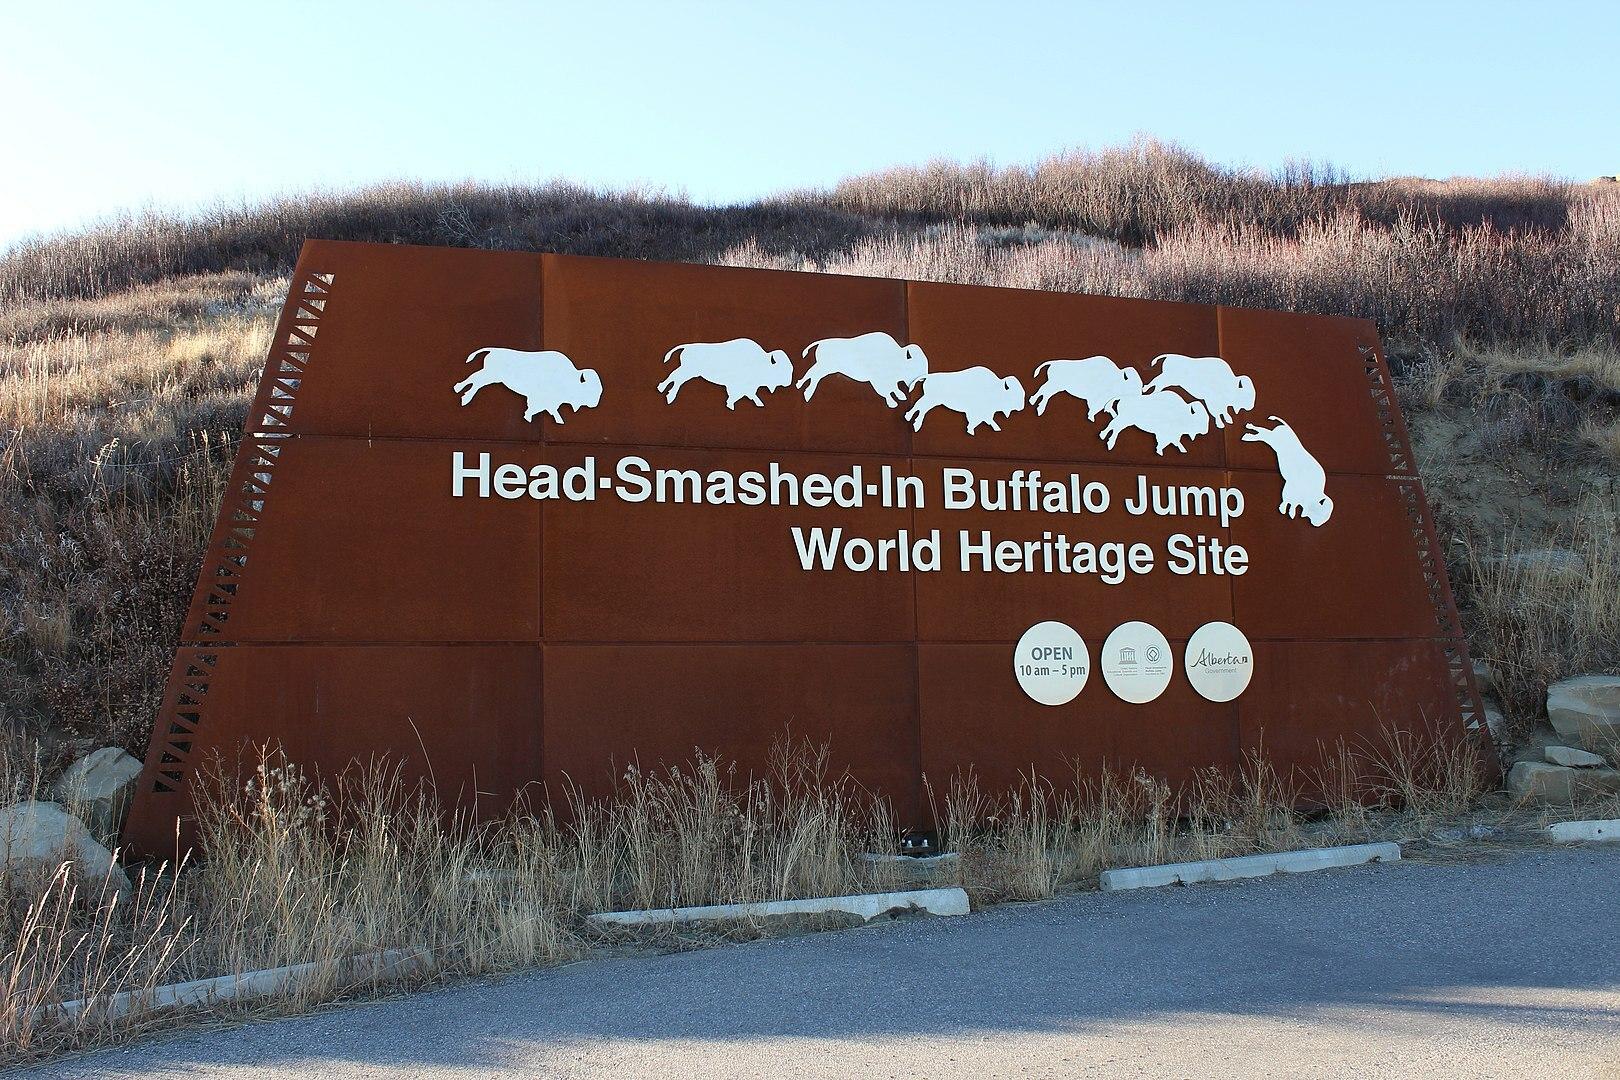 Head-Smashed-In Buffalo Jump entrance